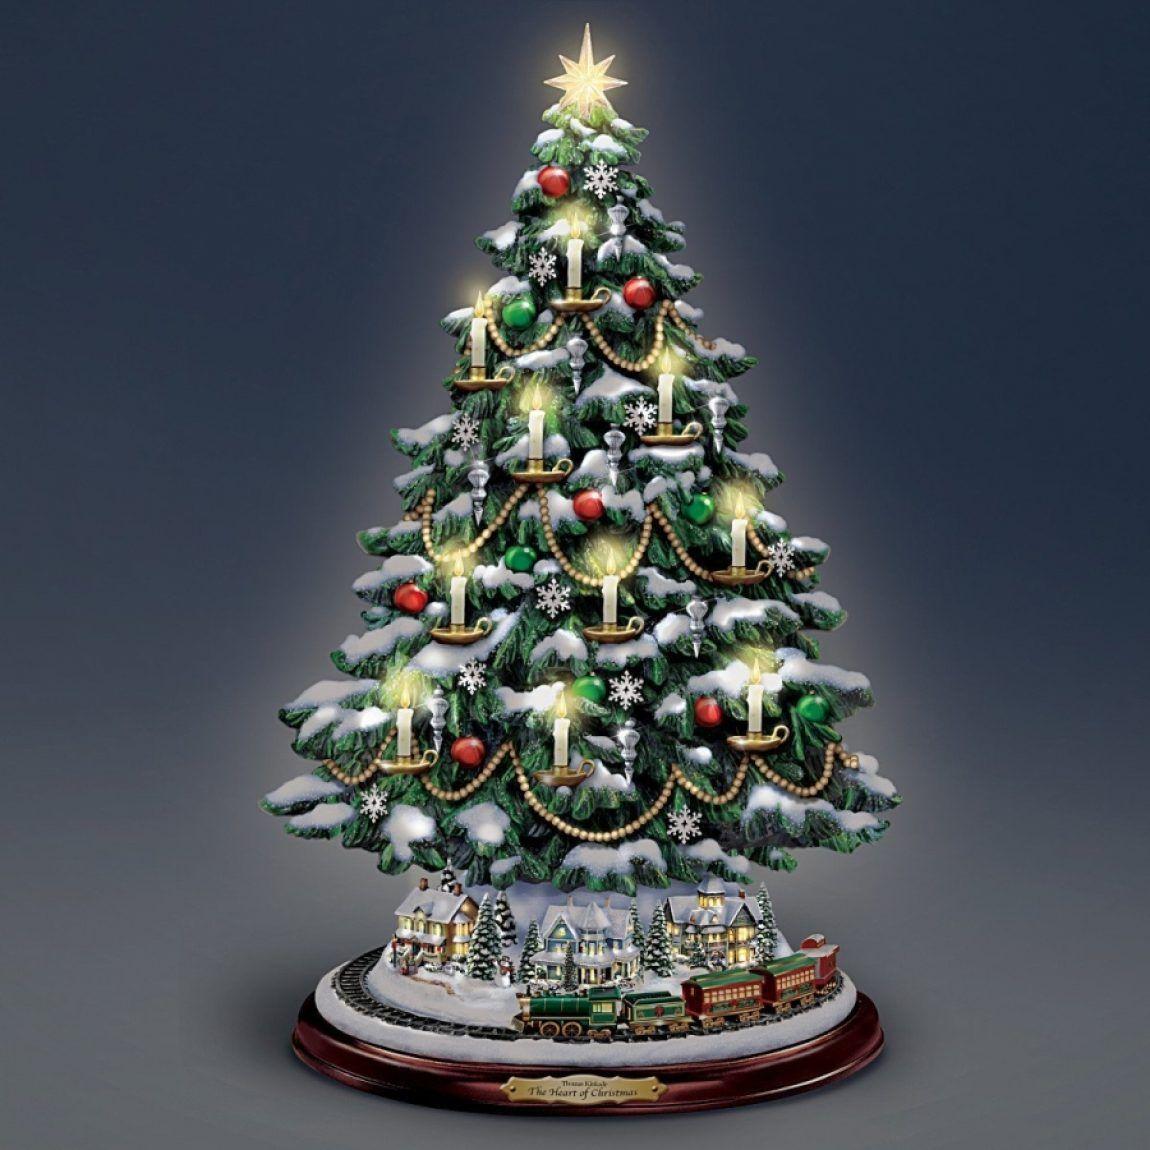 Thomas Kinkade Candlelit Tabletop Tree With Lights Thomas Kinkade Christmas Christmas Tree Lighting Tabletop Christmas Tree